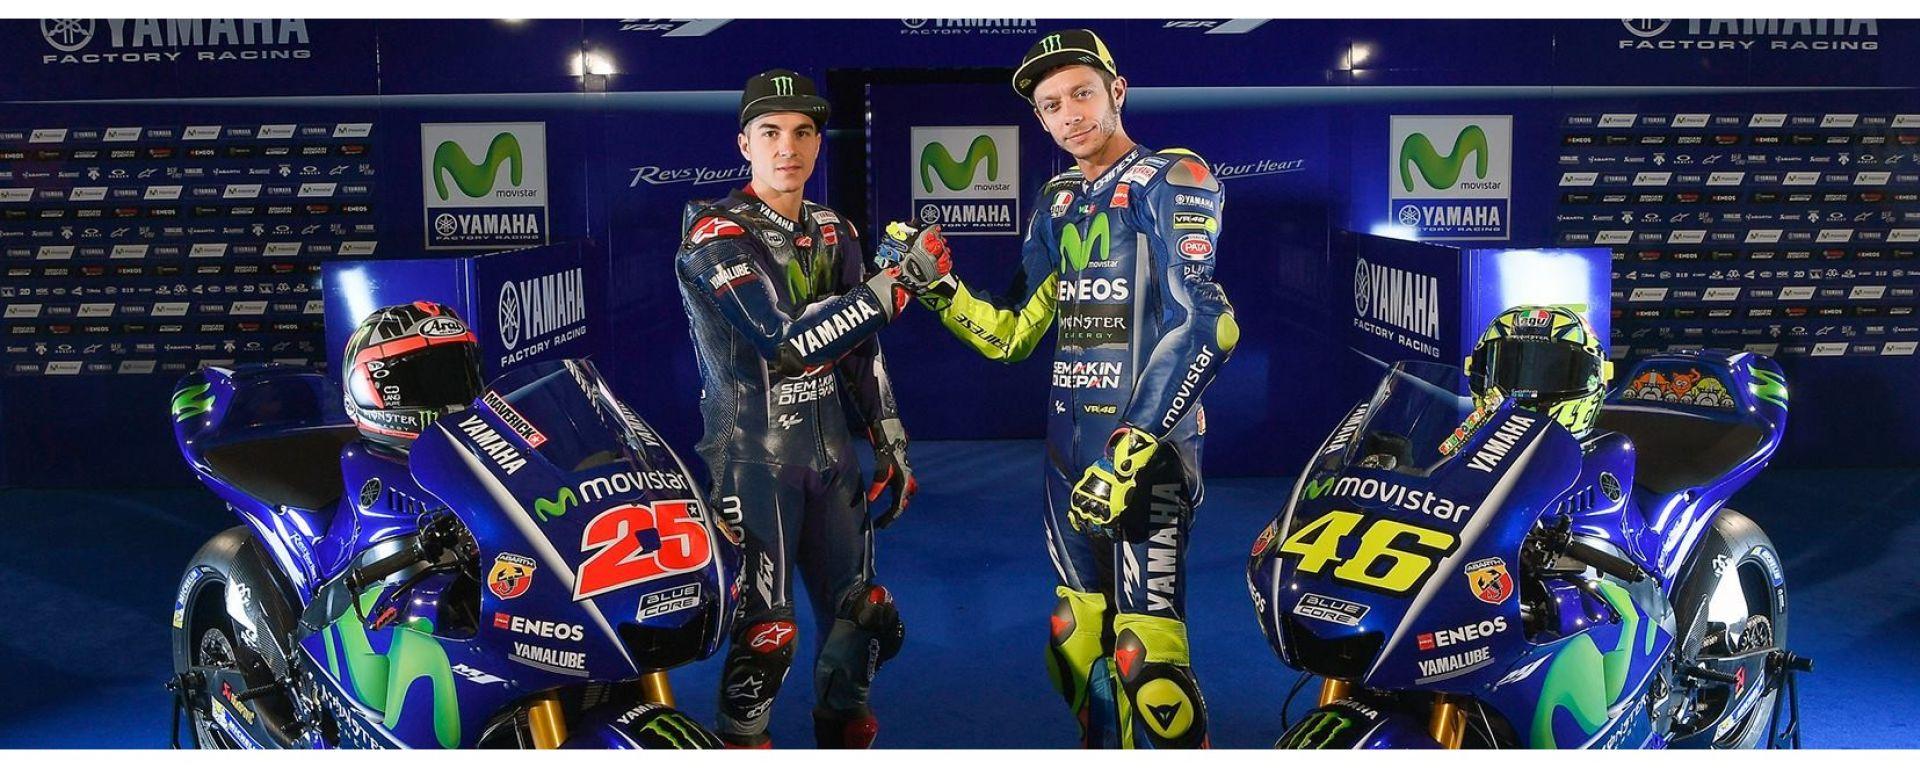 MotoGP 2017: Valentino Rossi e Maverick Vinales svelano le nuove Yamaha MotoGP 2017